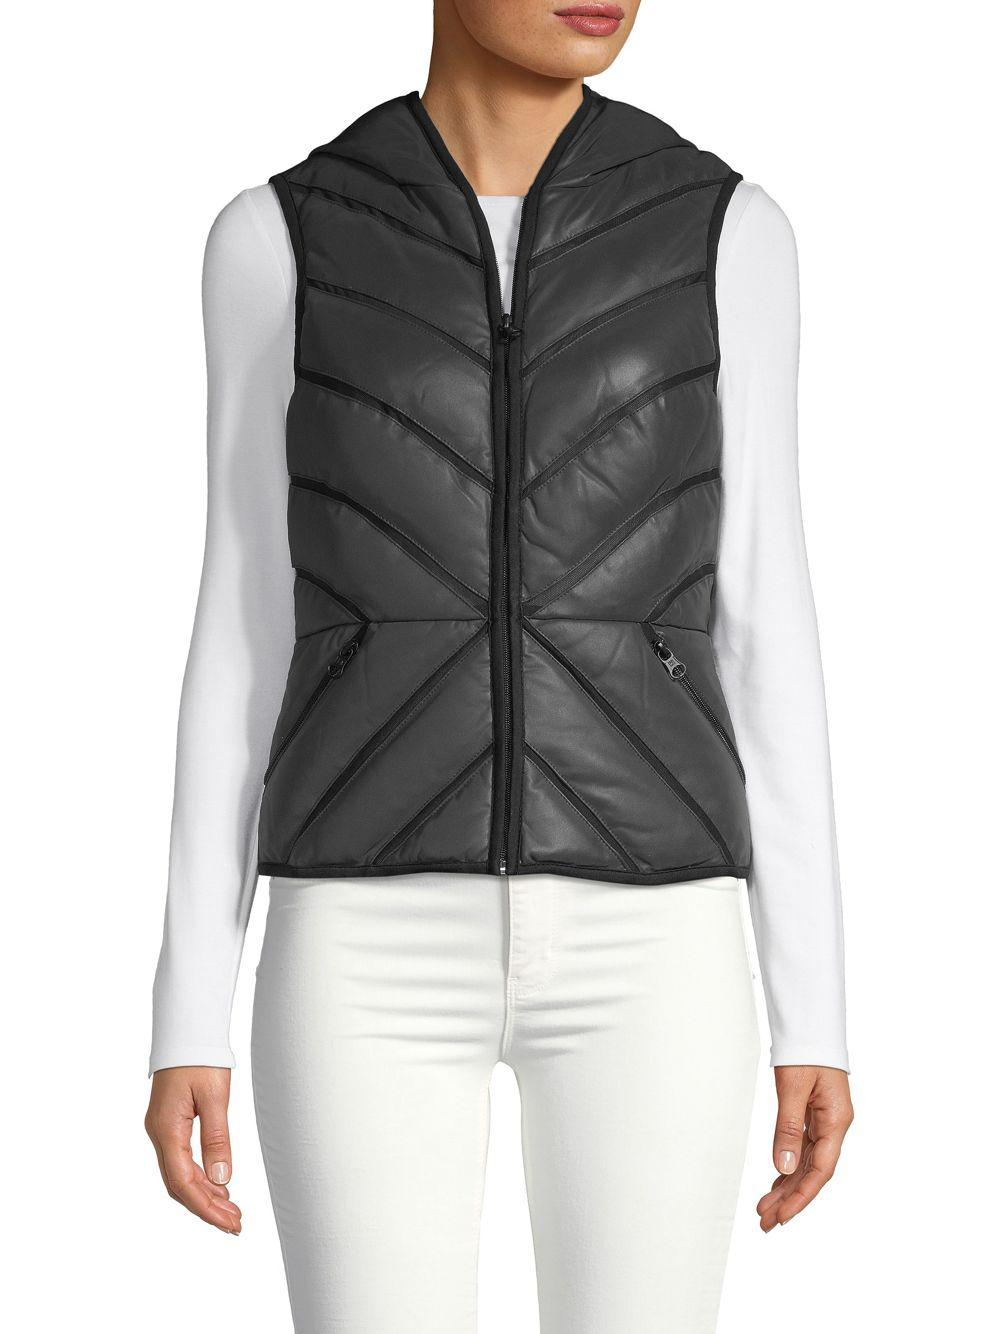 c0a8c0c68bca Lyst - BLANC NOIR Mesh Inset Reflective Puffer Vest in Black